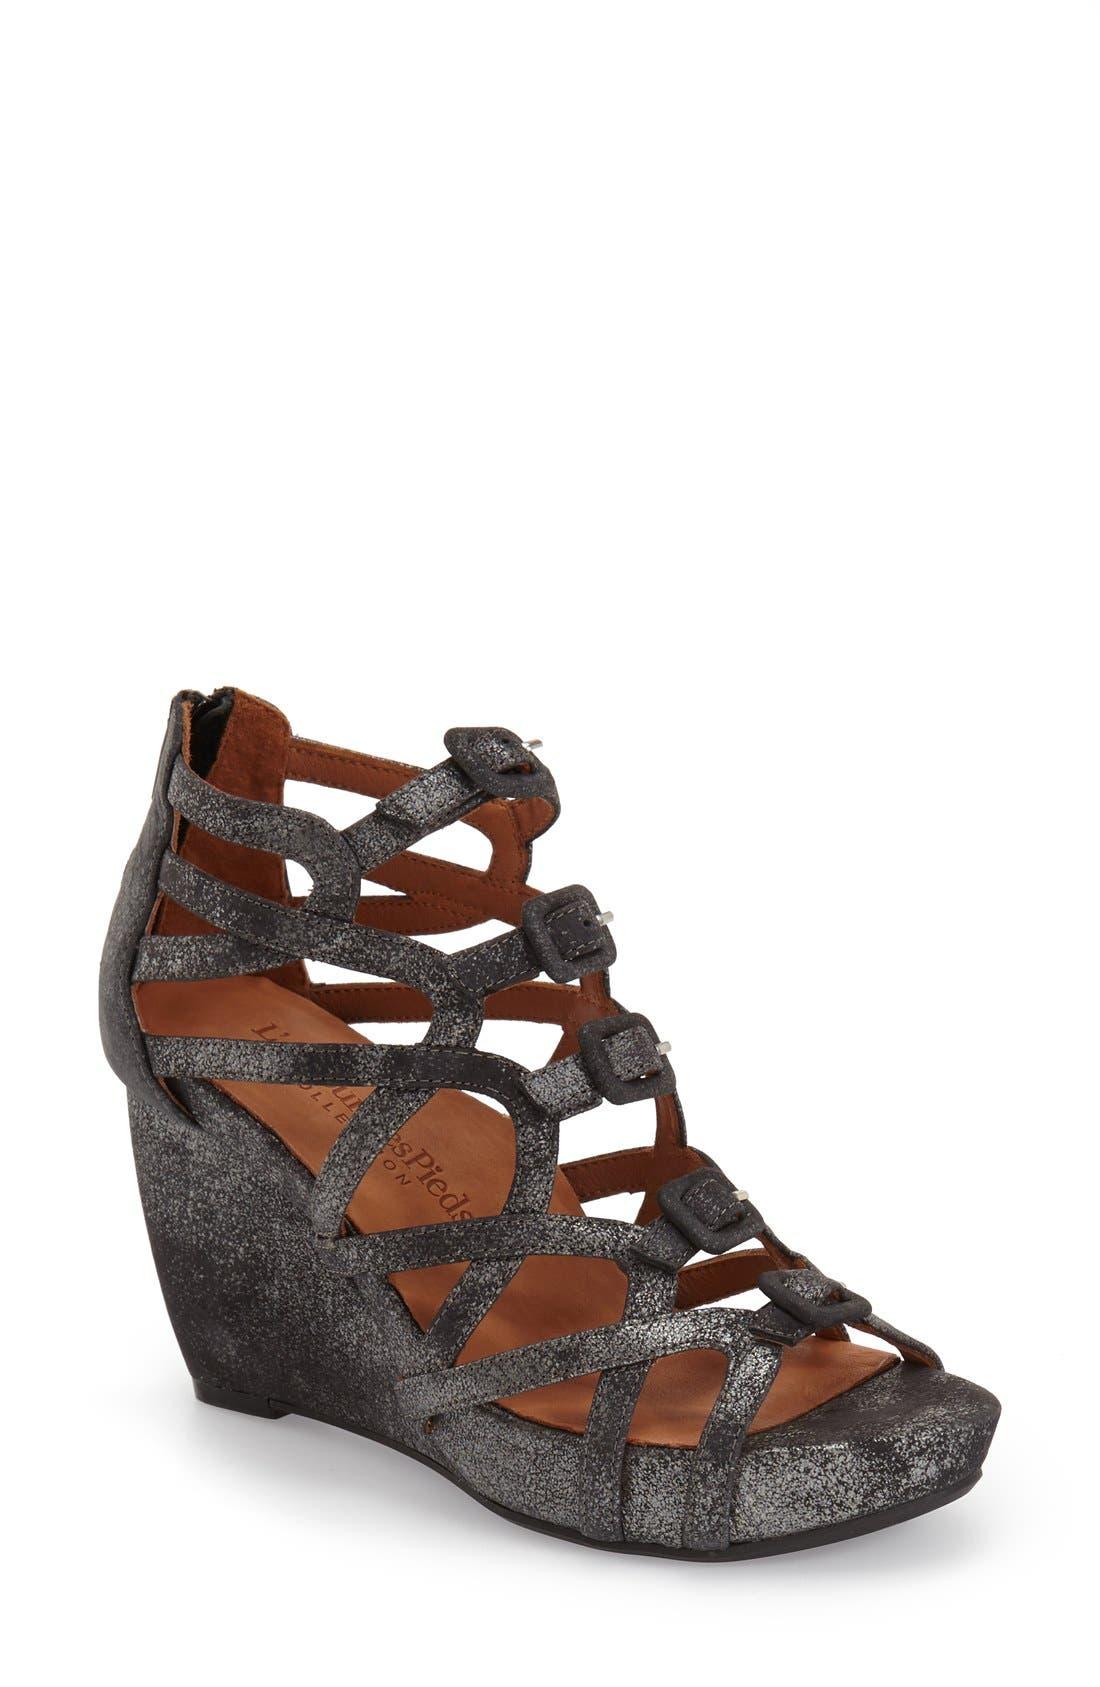 Ivanna' Gladiator Wedge Sandal,                         Main,                         color, Graphite Leather